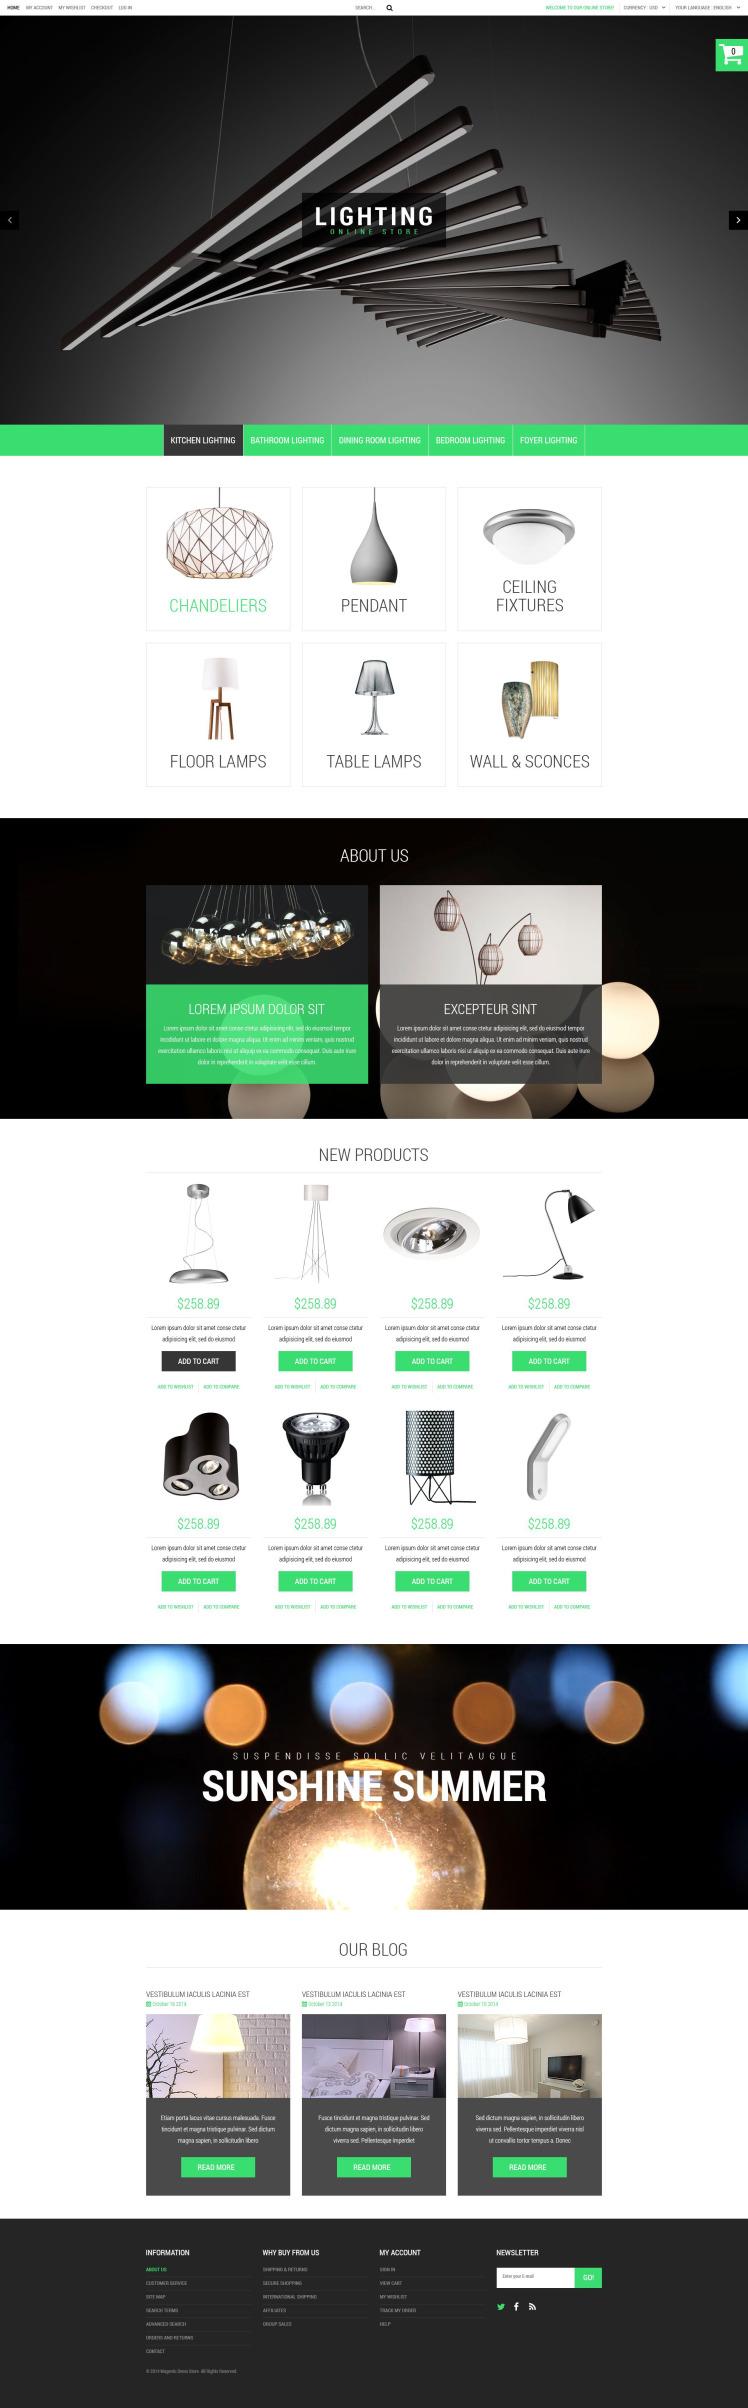 House Lighting Magento Themes